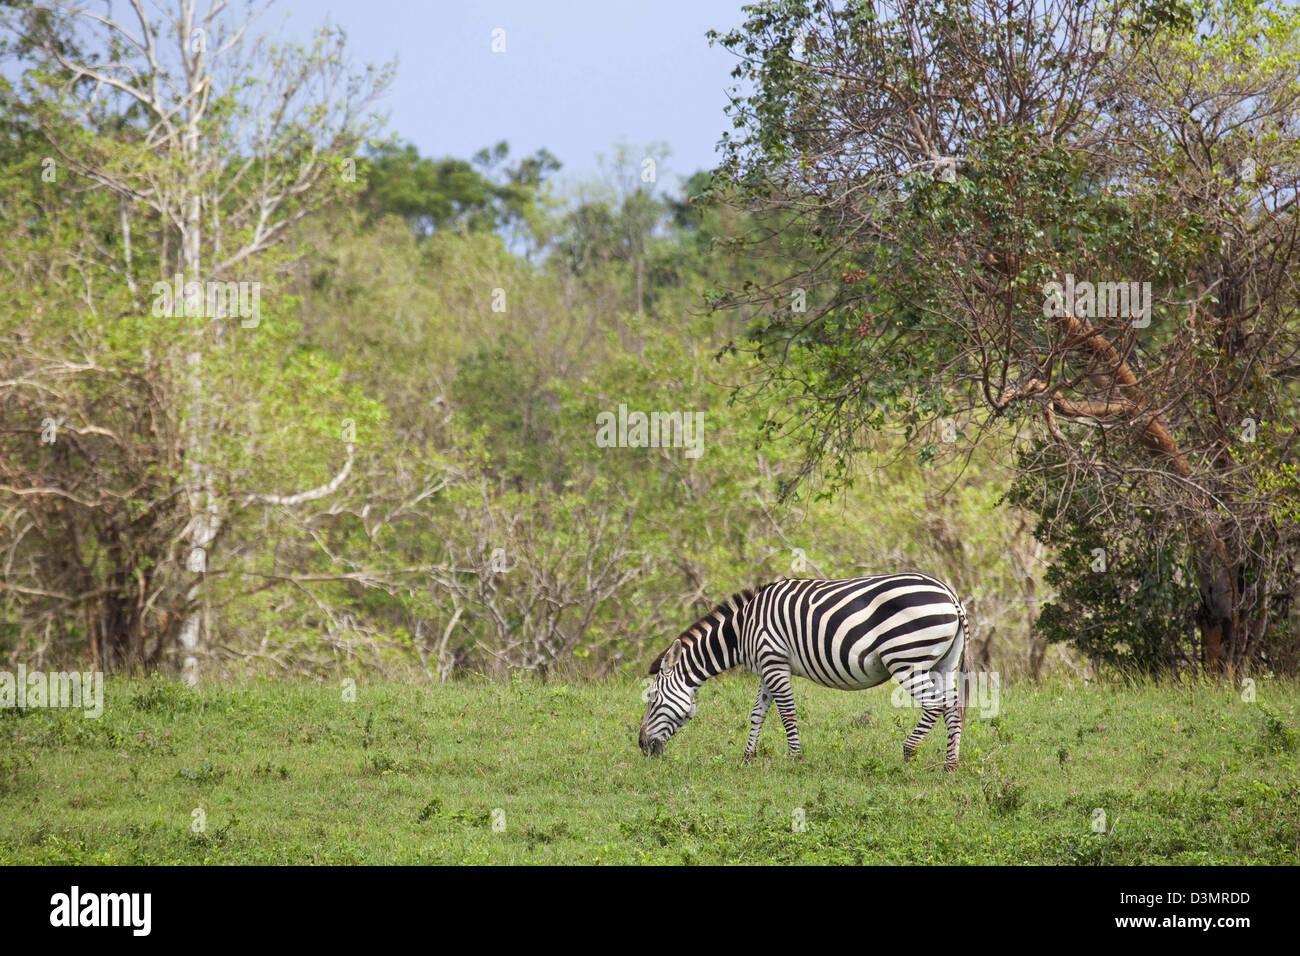 Plains zebra (Equus quagga / Equus burchelli) grazing on the island Cayo Saetia / Cayo Sae-Tia, Cuba, Caribbean Stock Photo